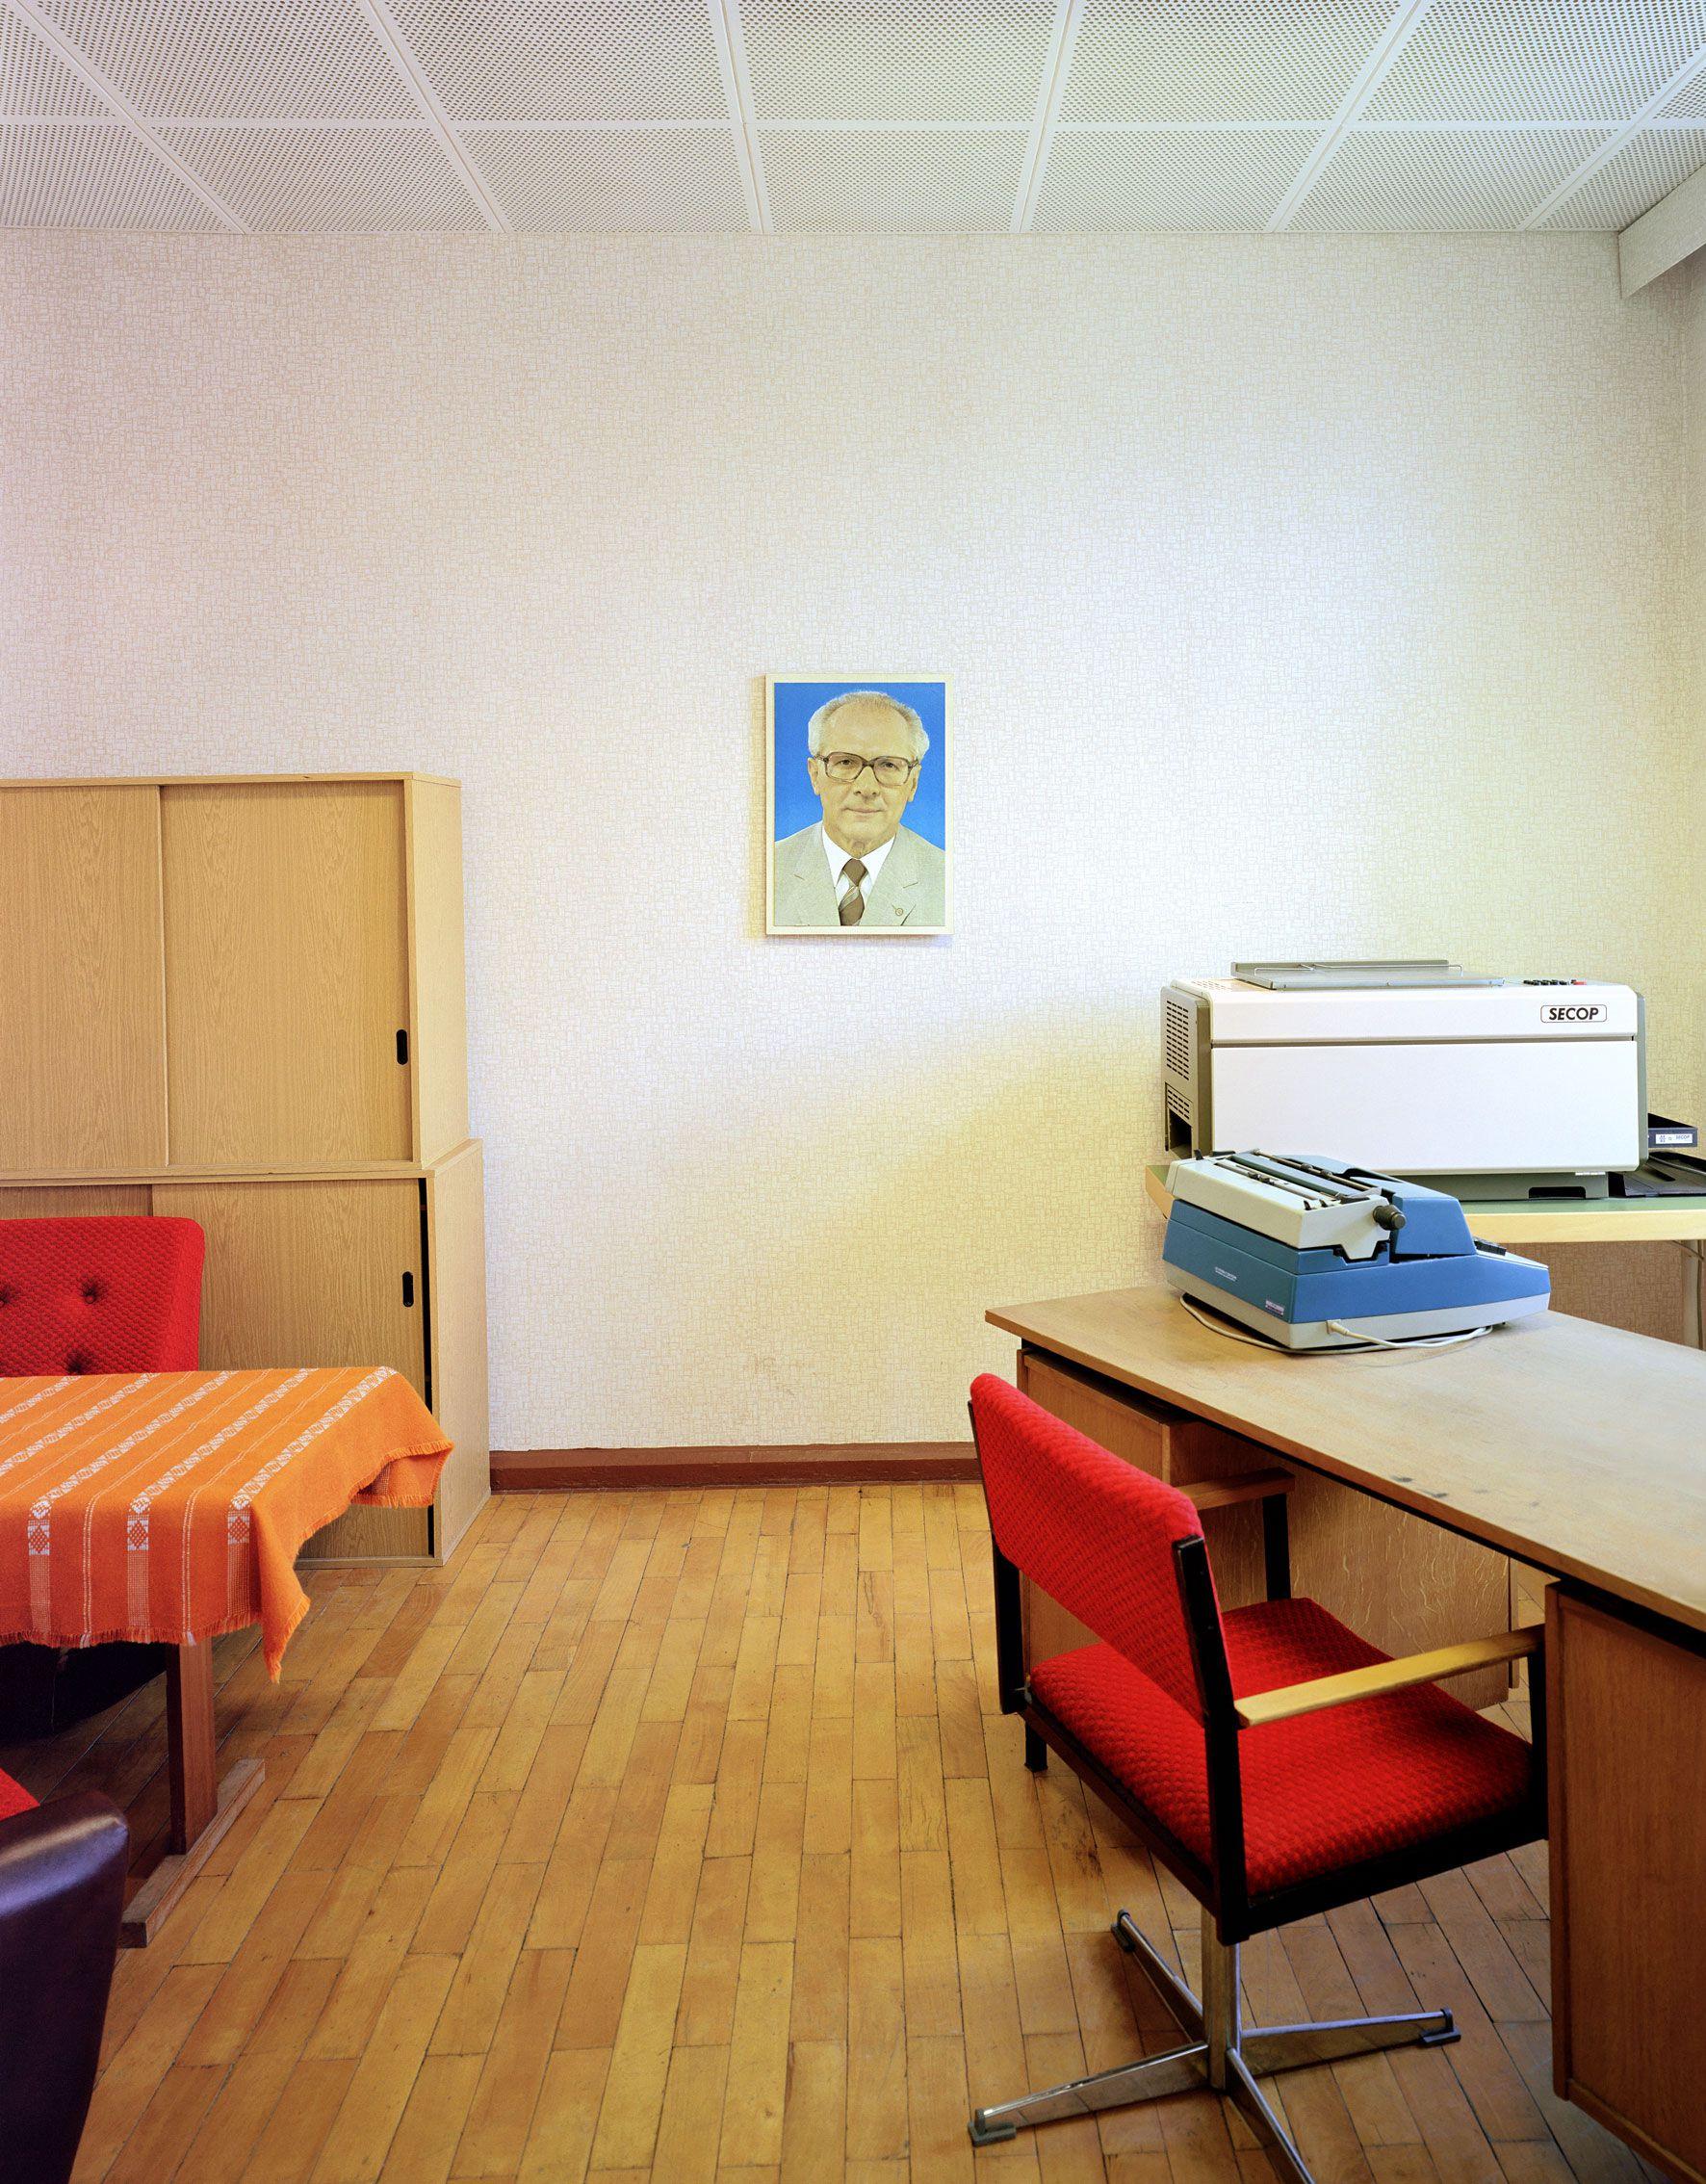 Bautzen prison director's office